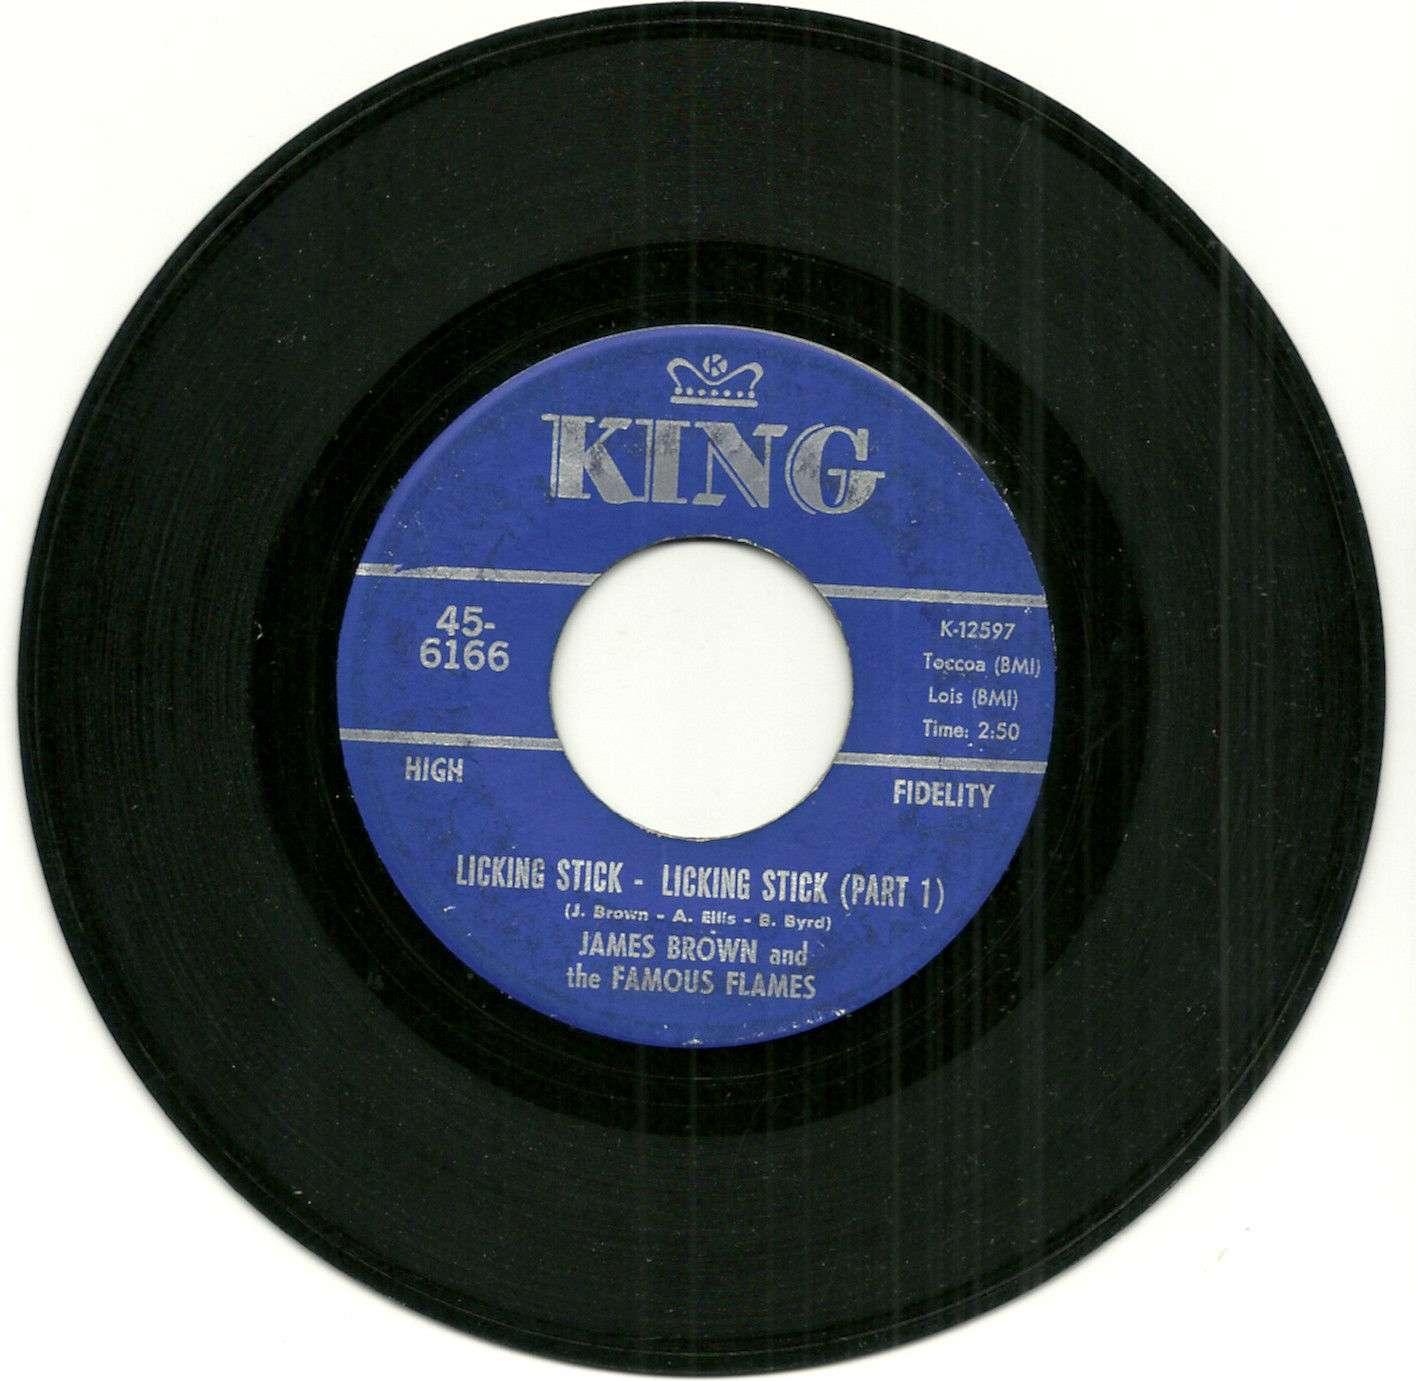 James Brown - Licking Stick, Licking Stick, Part 1